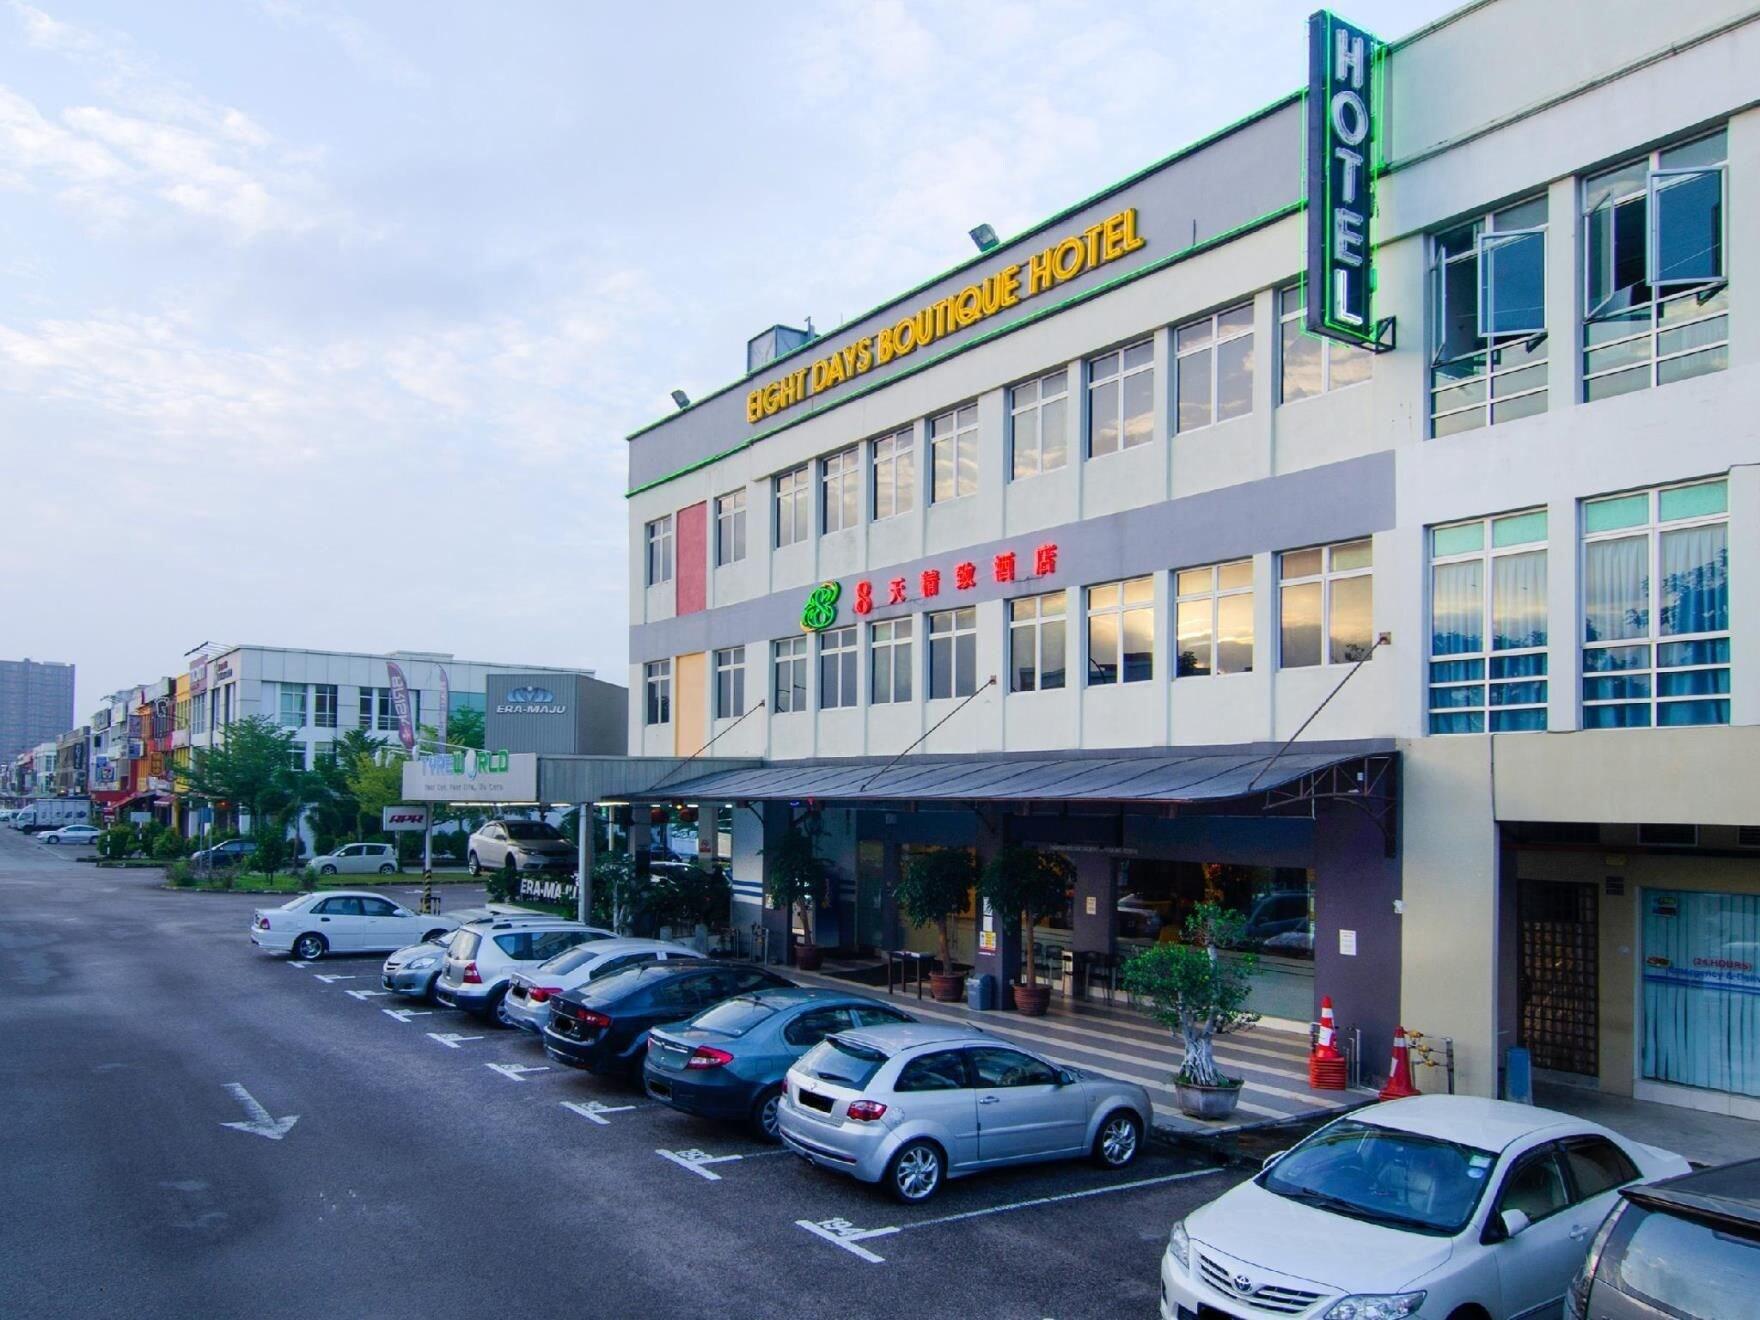 8 Days Boutique Hotel @ Mount Austin JB, Johor Bahru